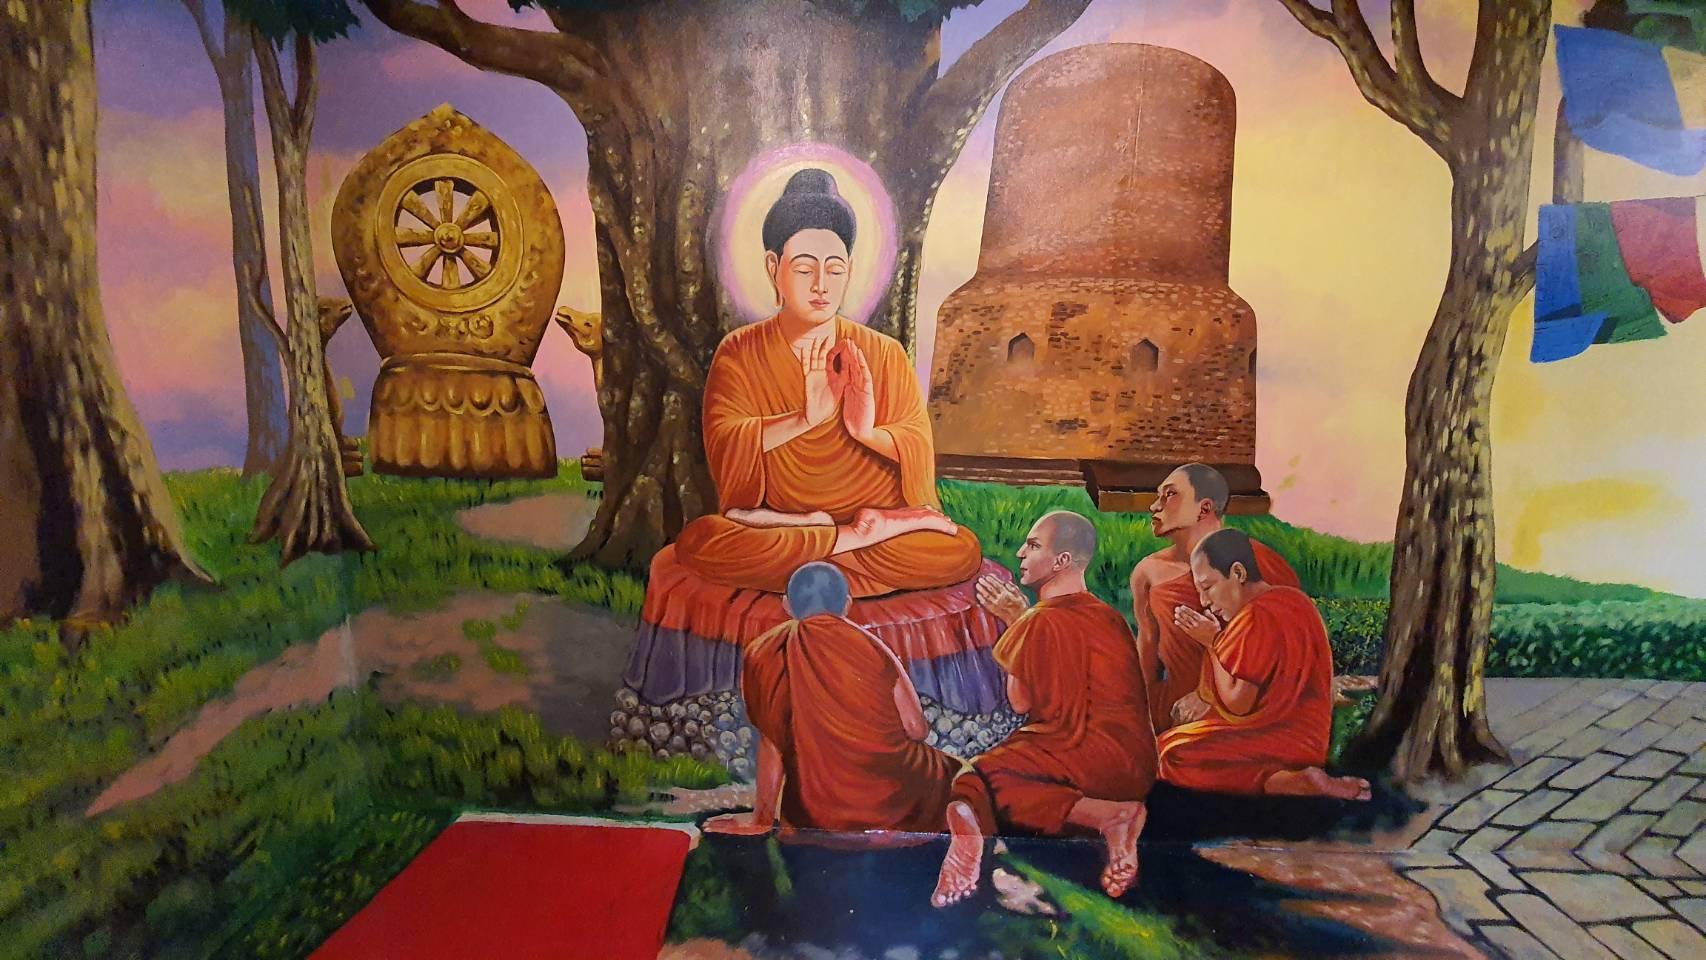 One Day Trip! ททท.ชวนเที่ยววัด จ.นนทบุรี-ปทุมธานี ไหว้พระสุขใจ สุขกาย สไตล์ NEW NORMAL